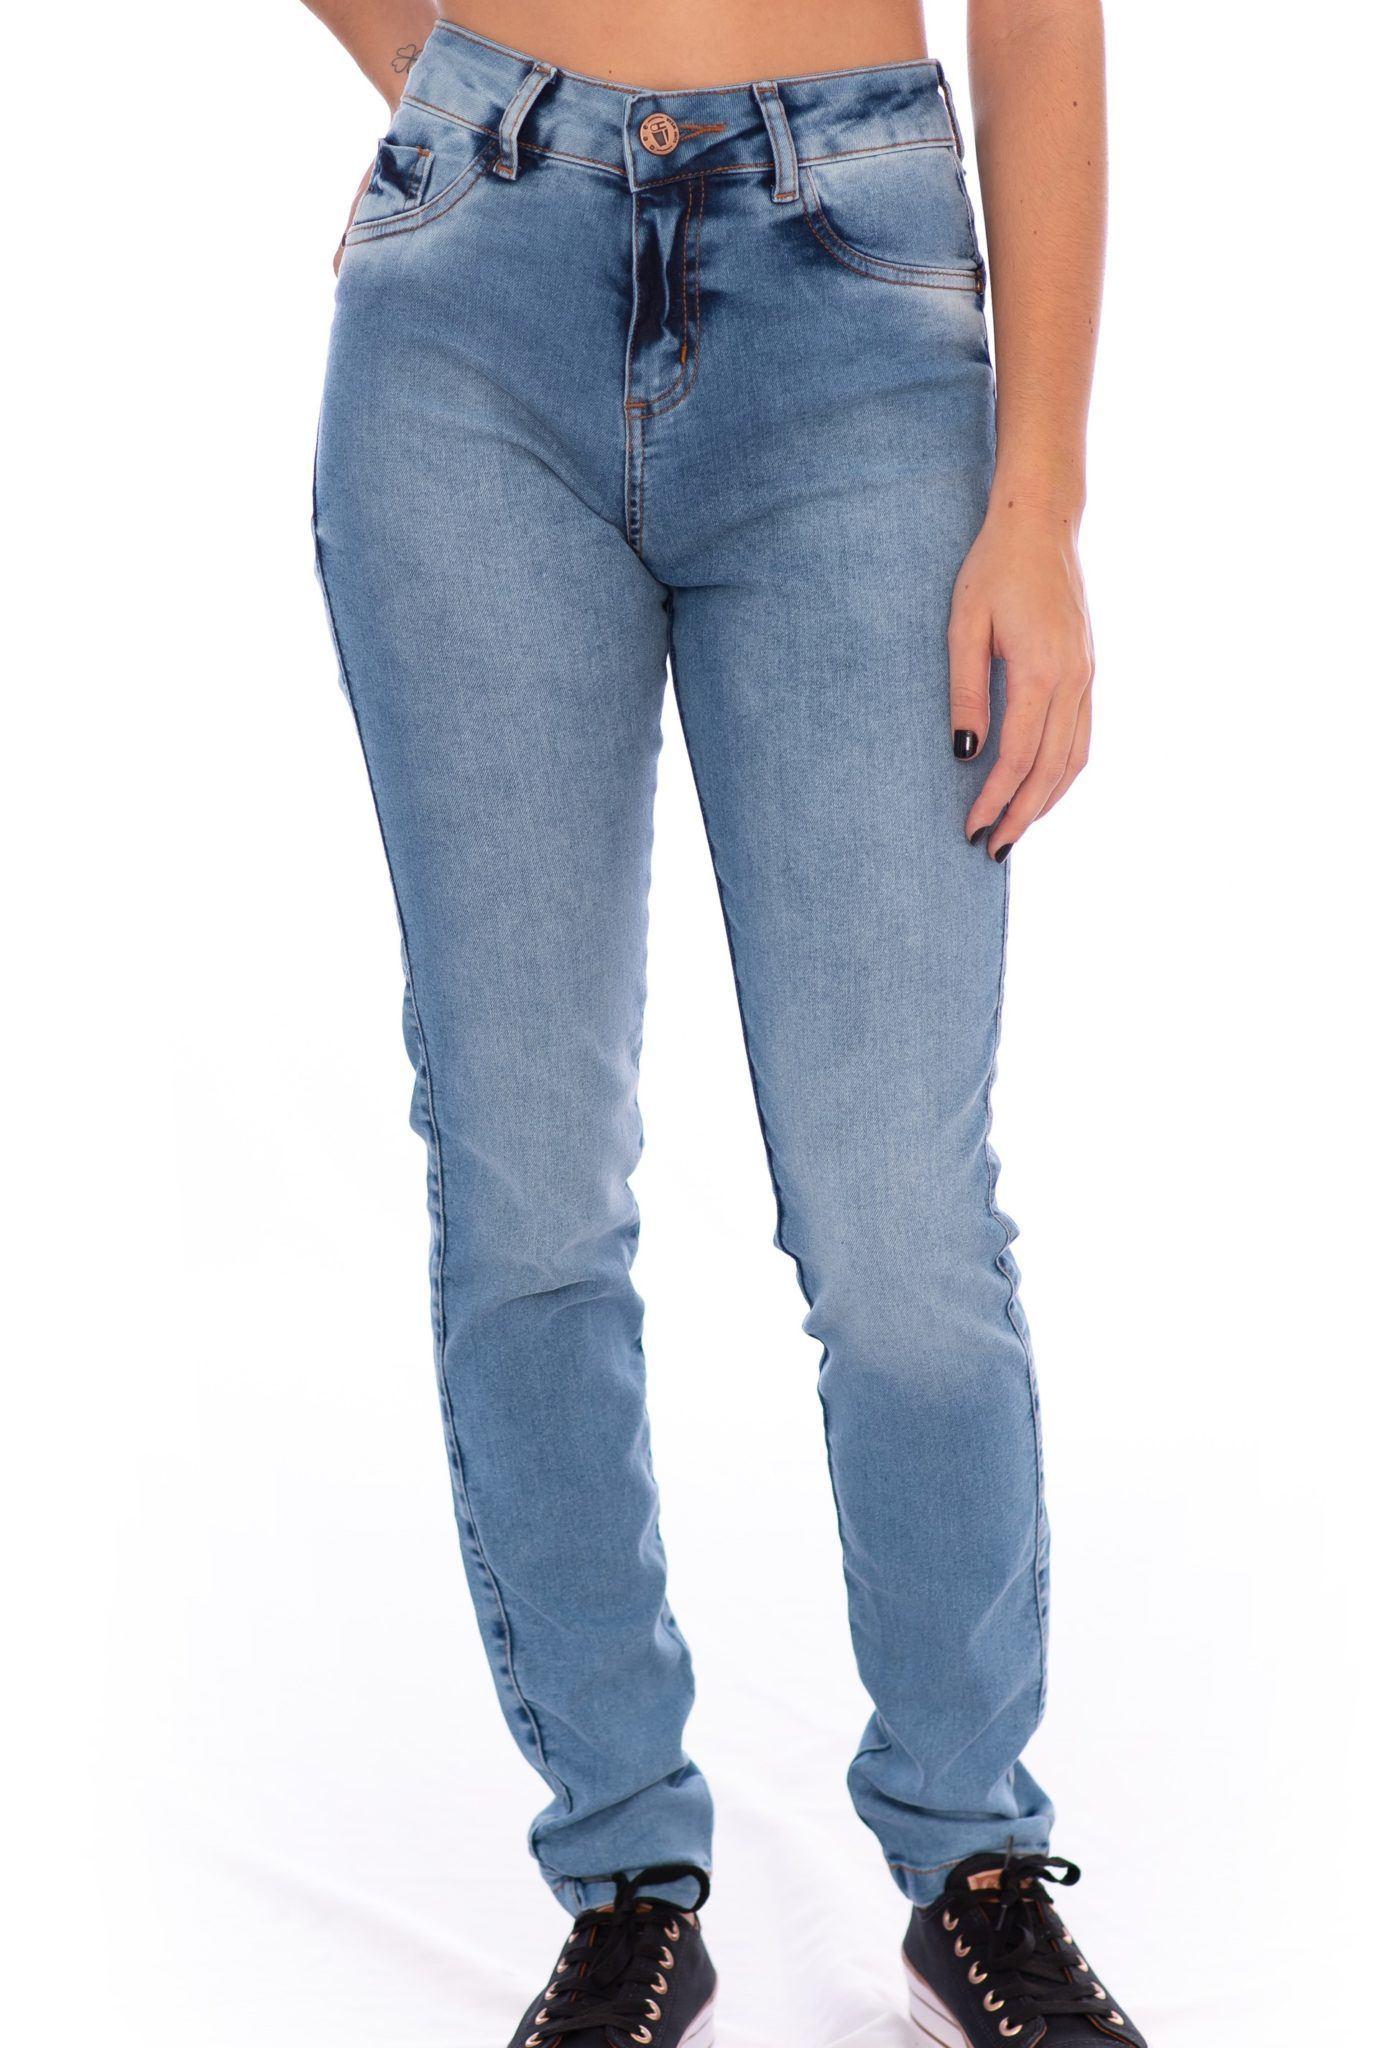 Calça Jeans Skinny Feminina Aee Surf